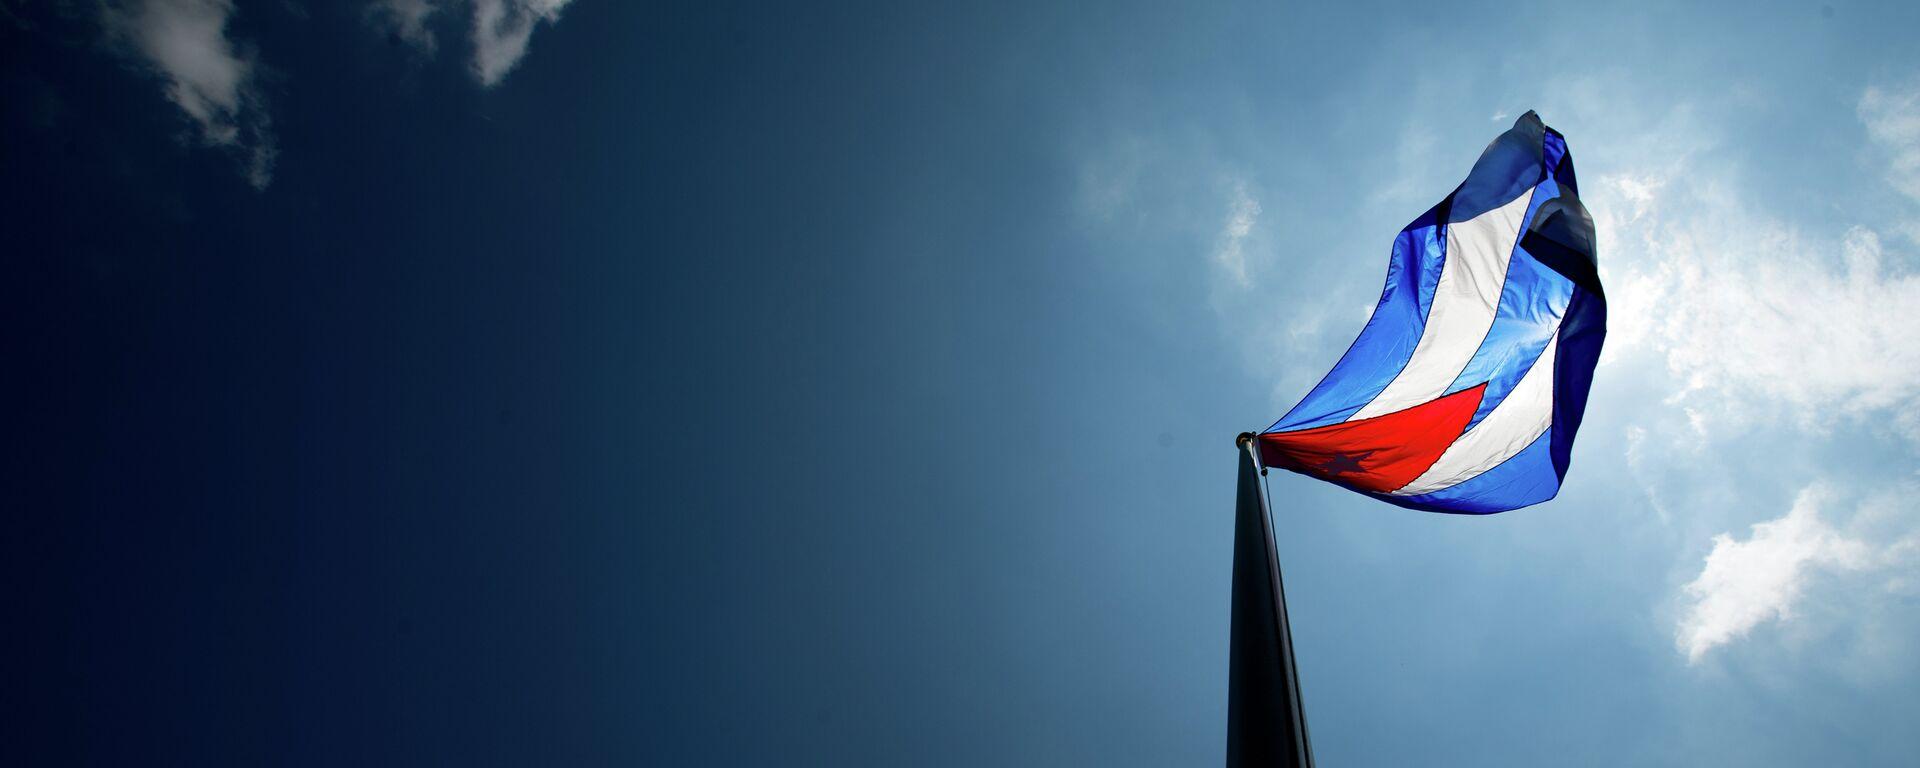 The Cuban flag over their new embassy in Washington, Monday, July 20, 2015. - Sputnik Mundo, 1920, 12.10.2021